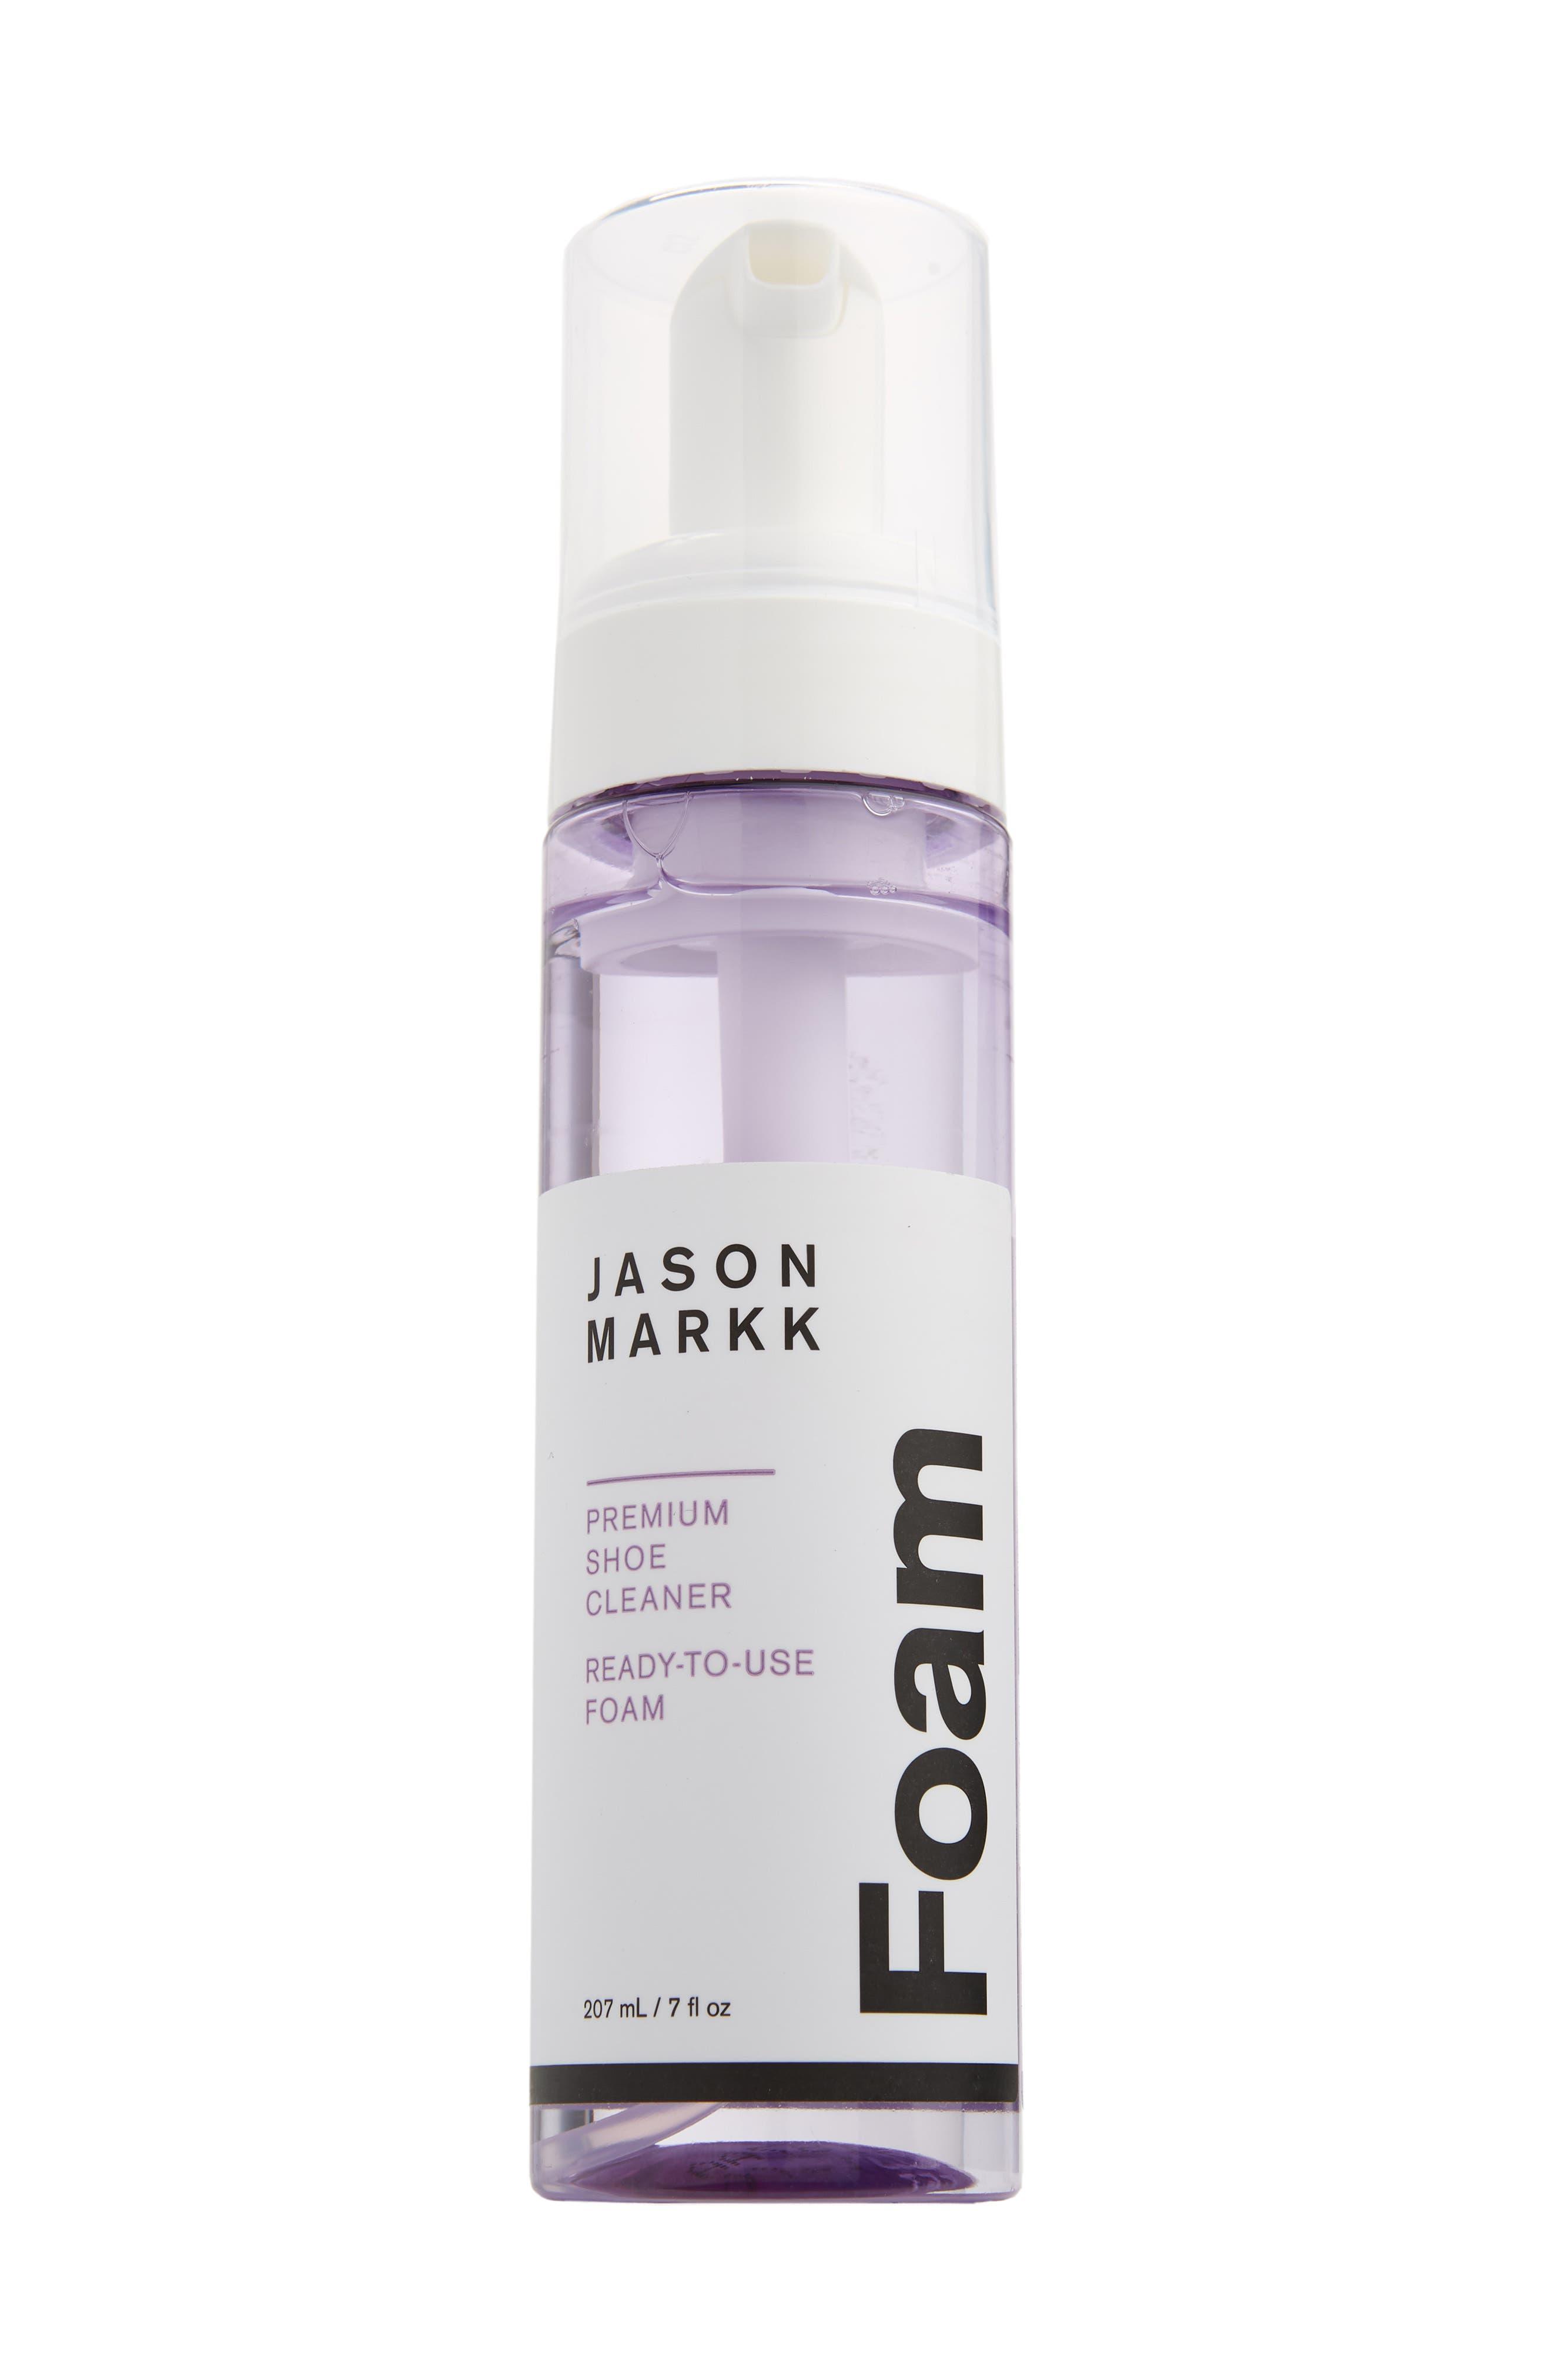 Jason Markk Ready-to-Use Foam Shoe Cleaner